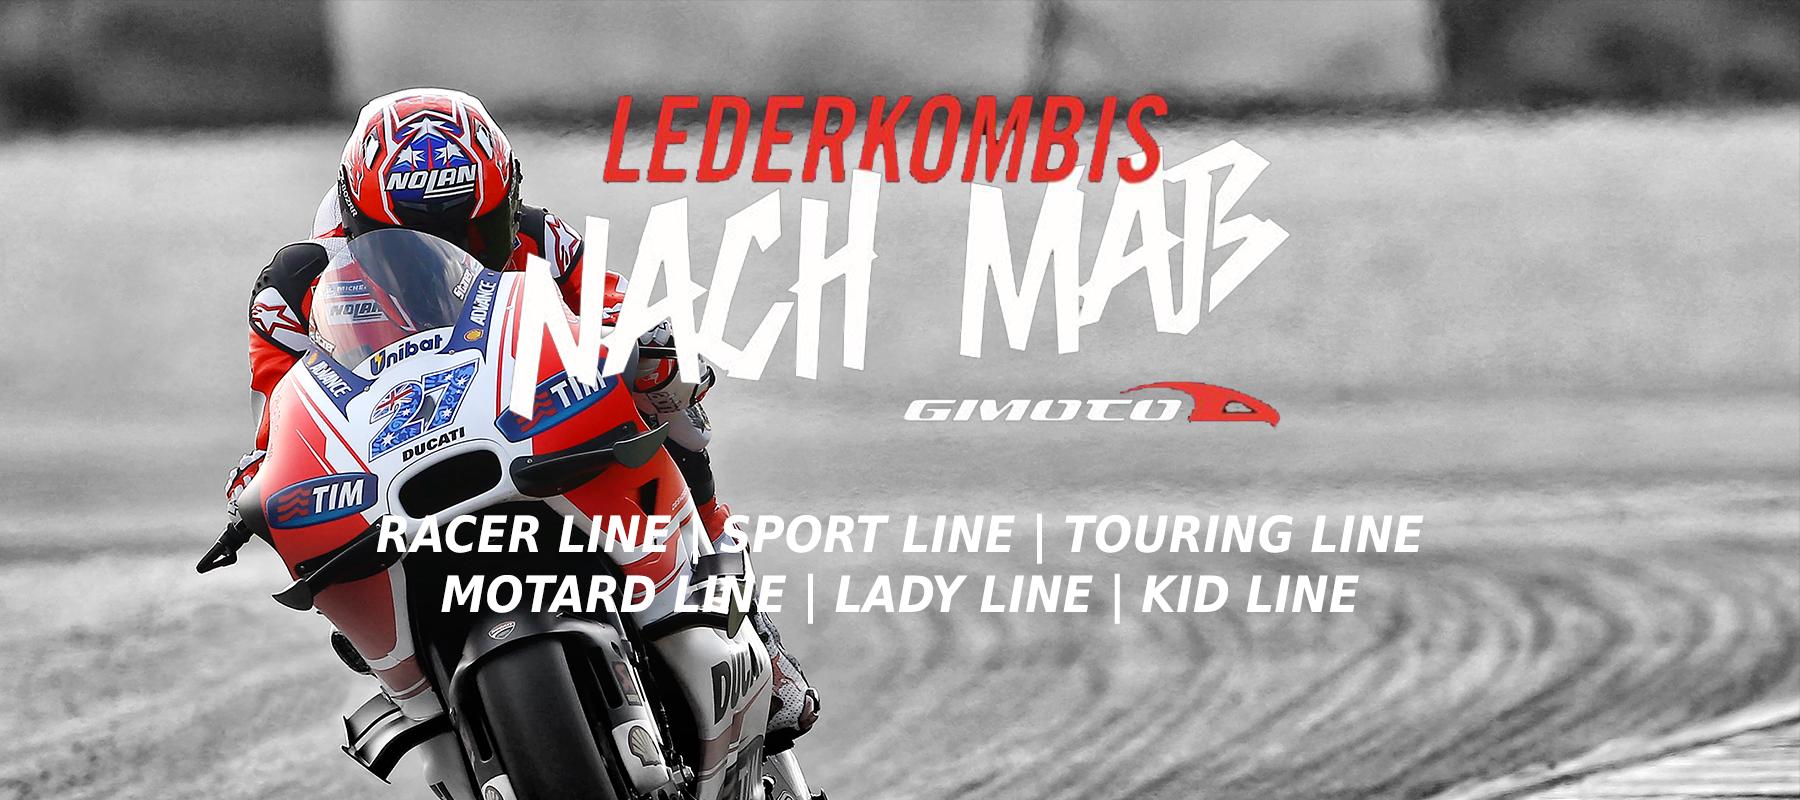 racepoint_lederkombi_nach_mass_slider